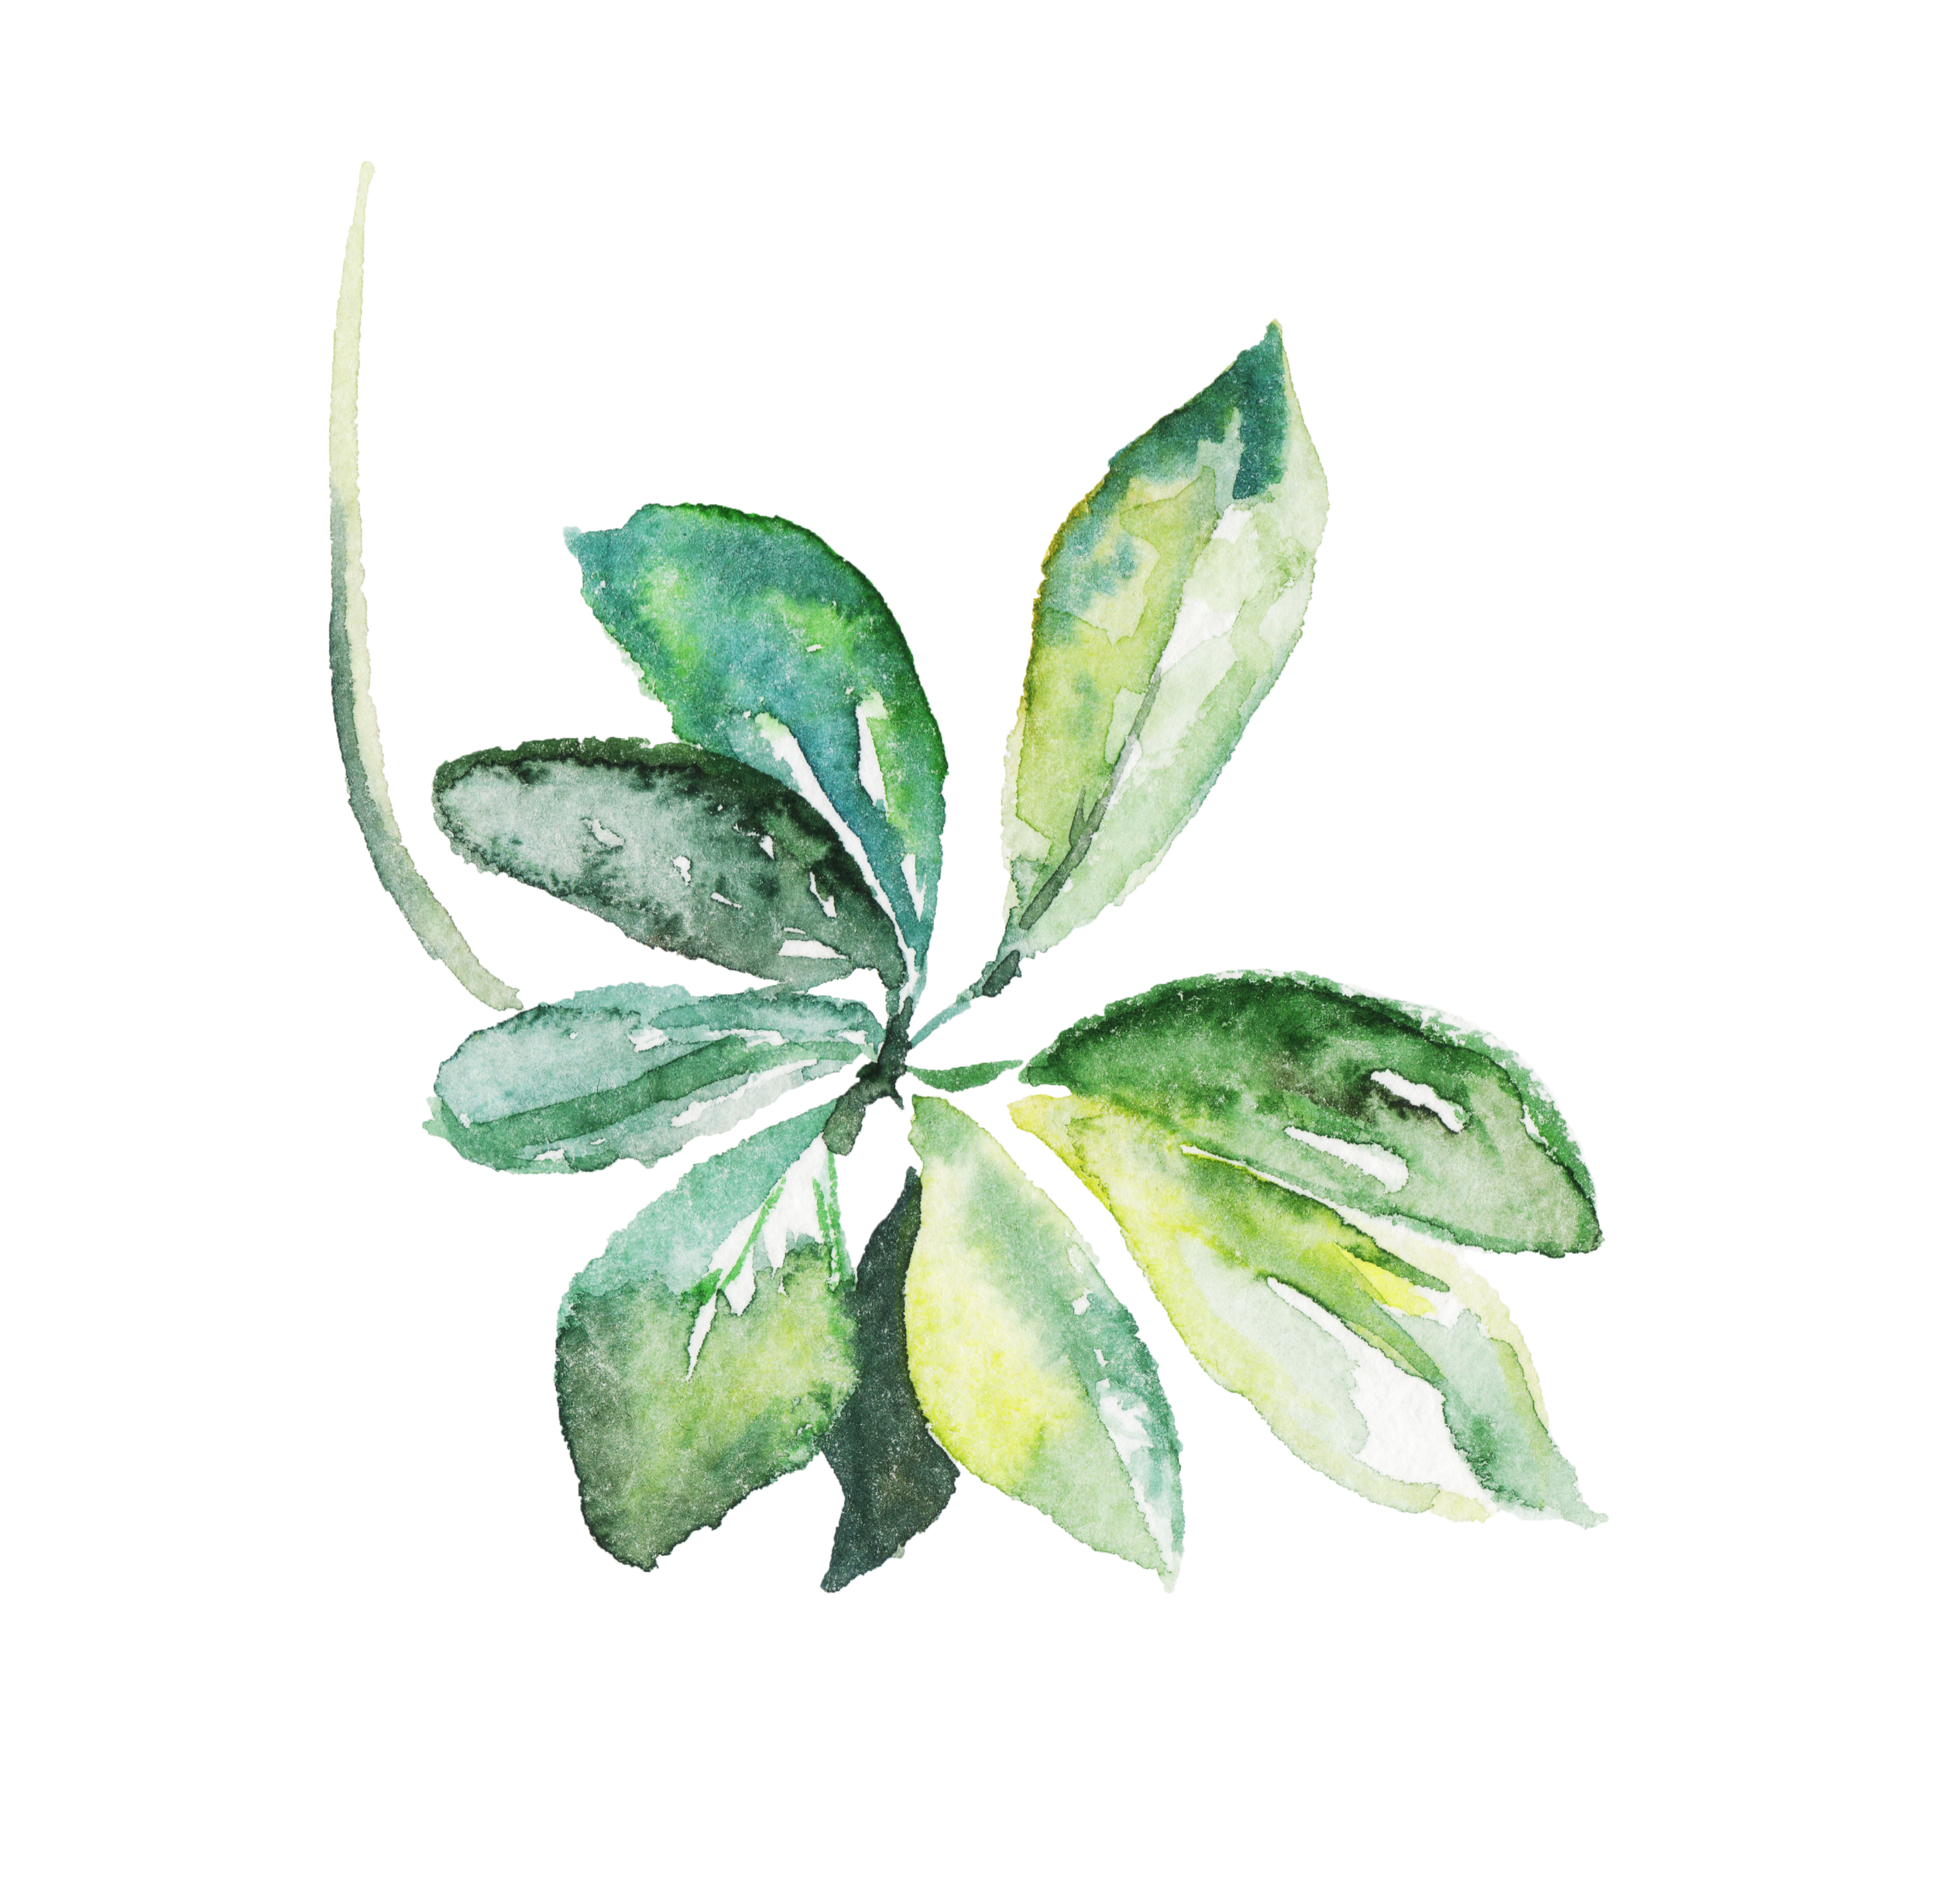 leaf 33.png